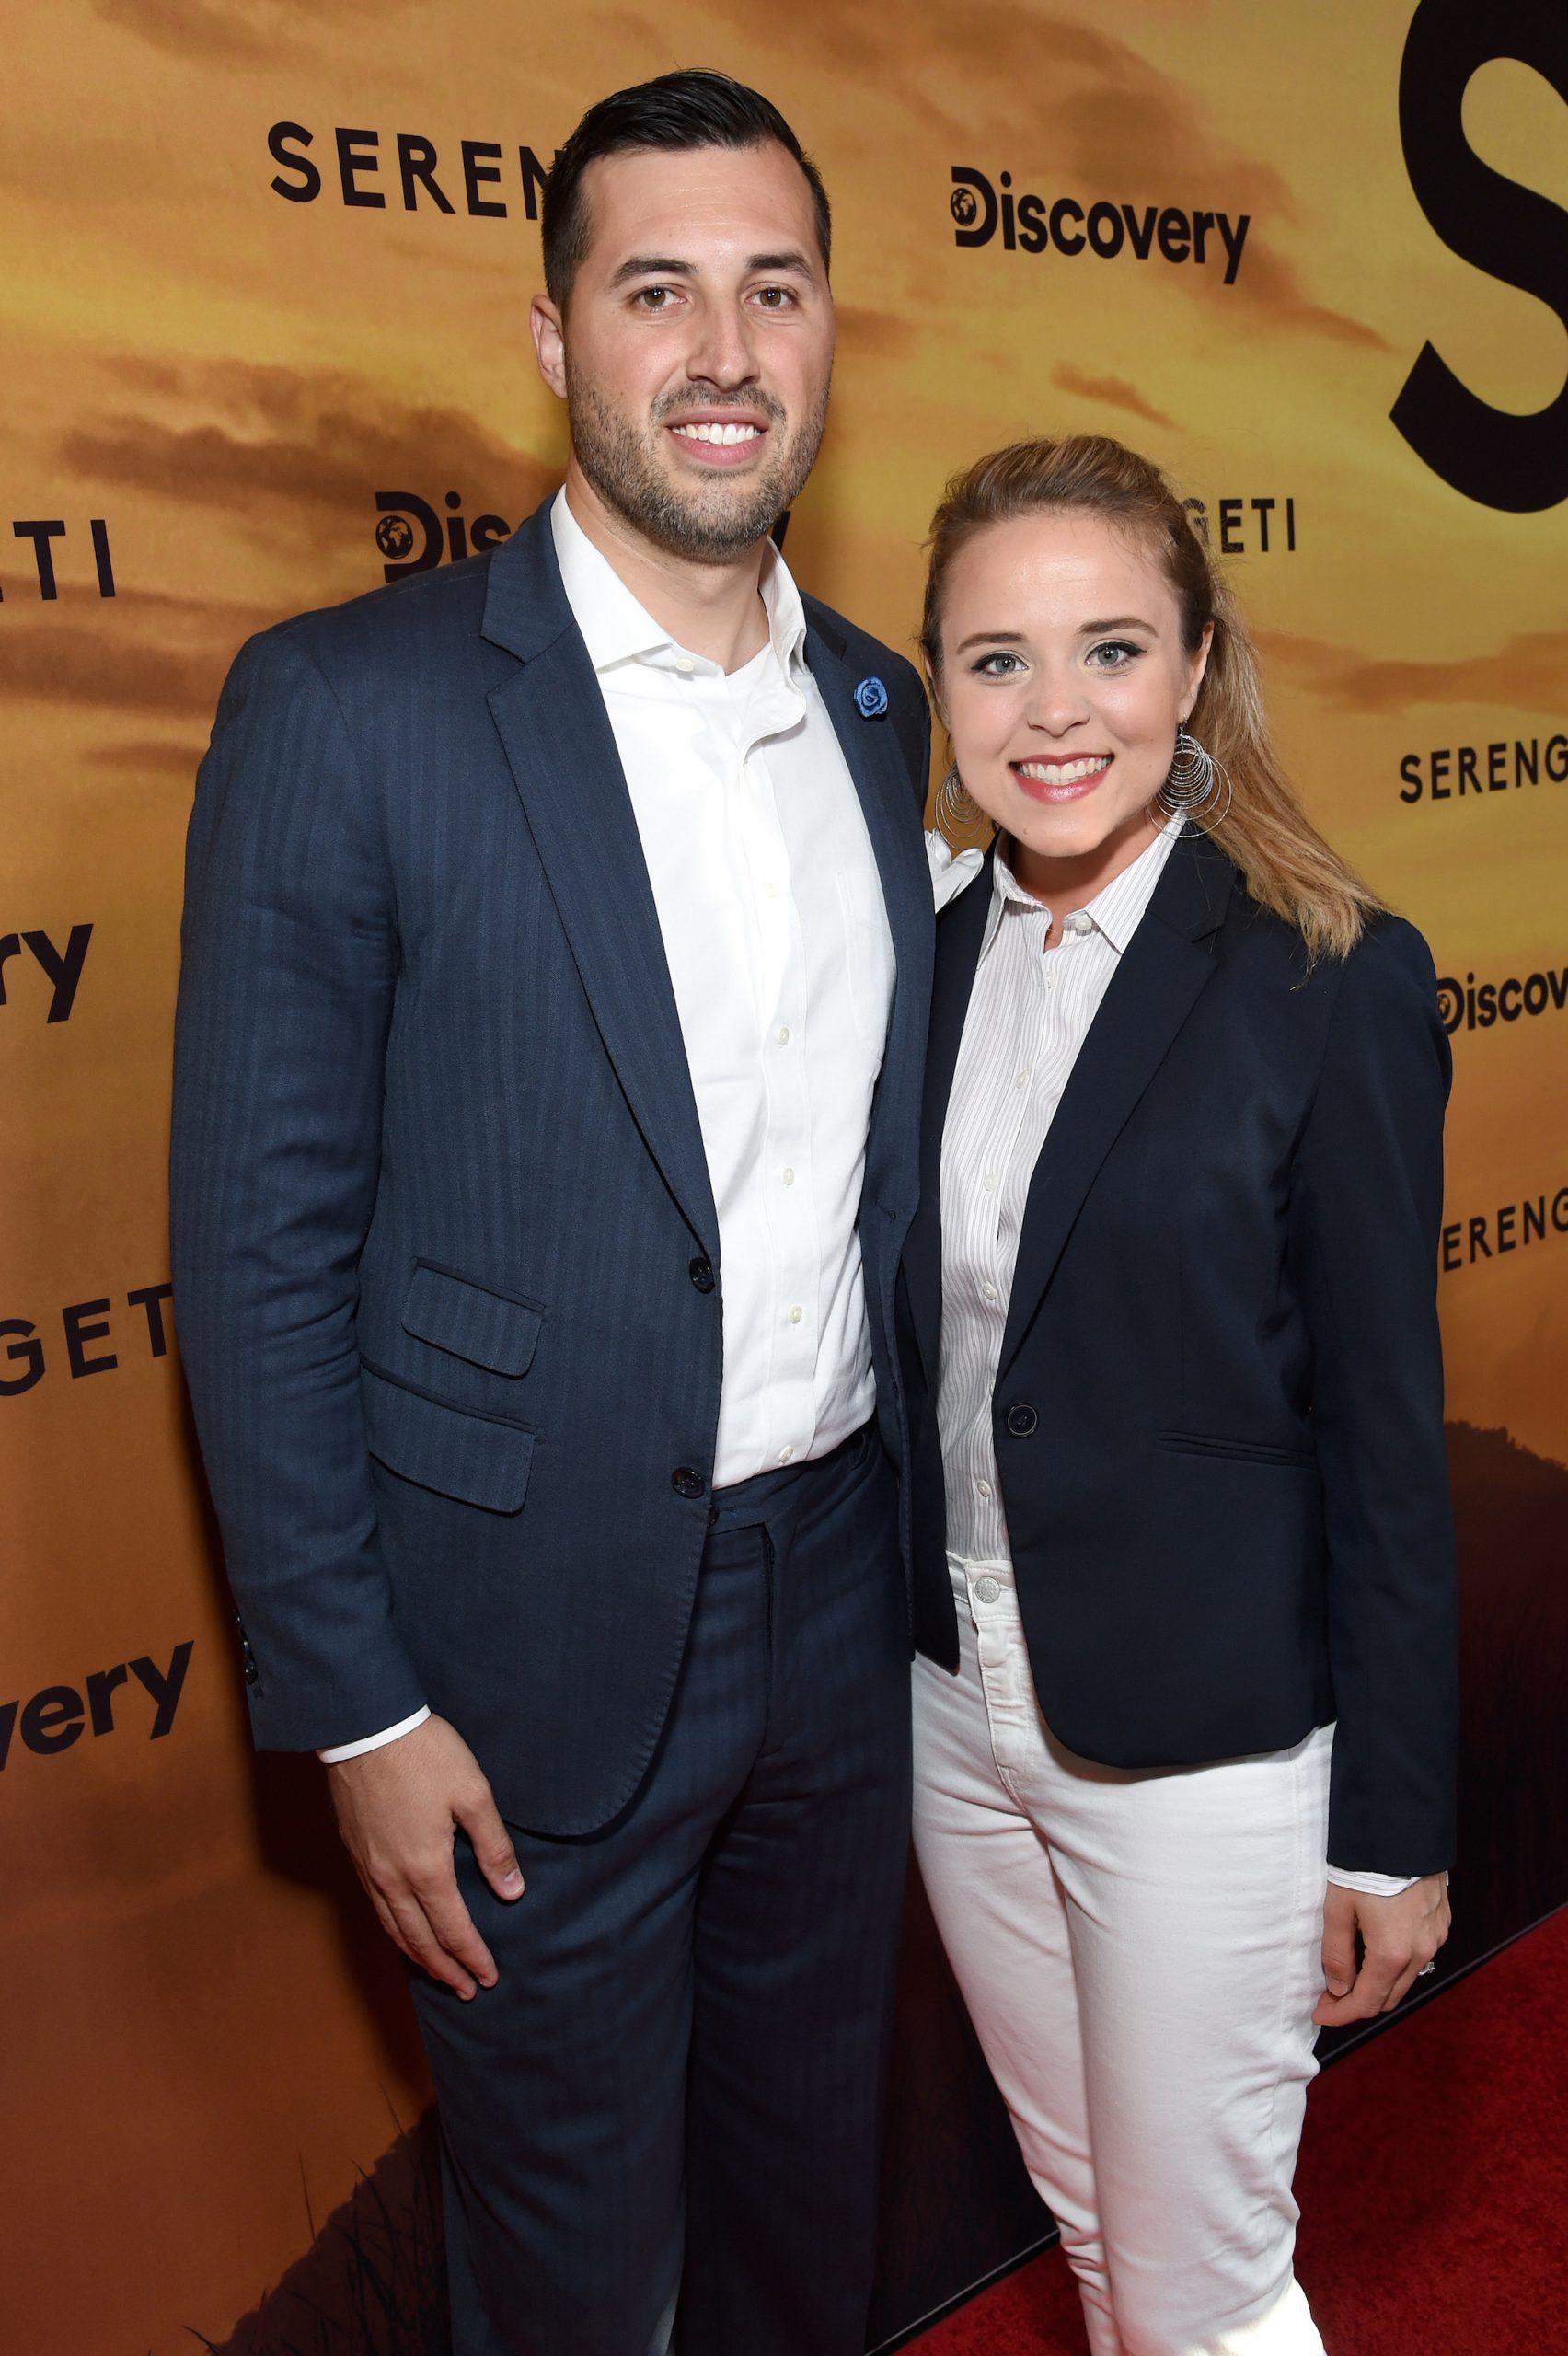 (L-R) Jeremy Vuolo and Jinger Duggar Vuolo attend Discovery's 'Serengeti' premiere